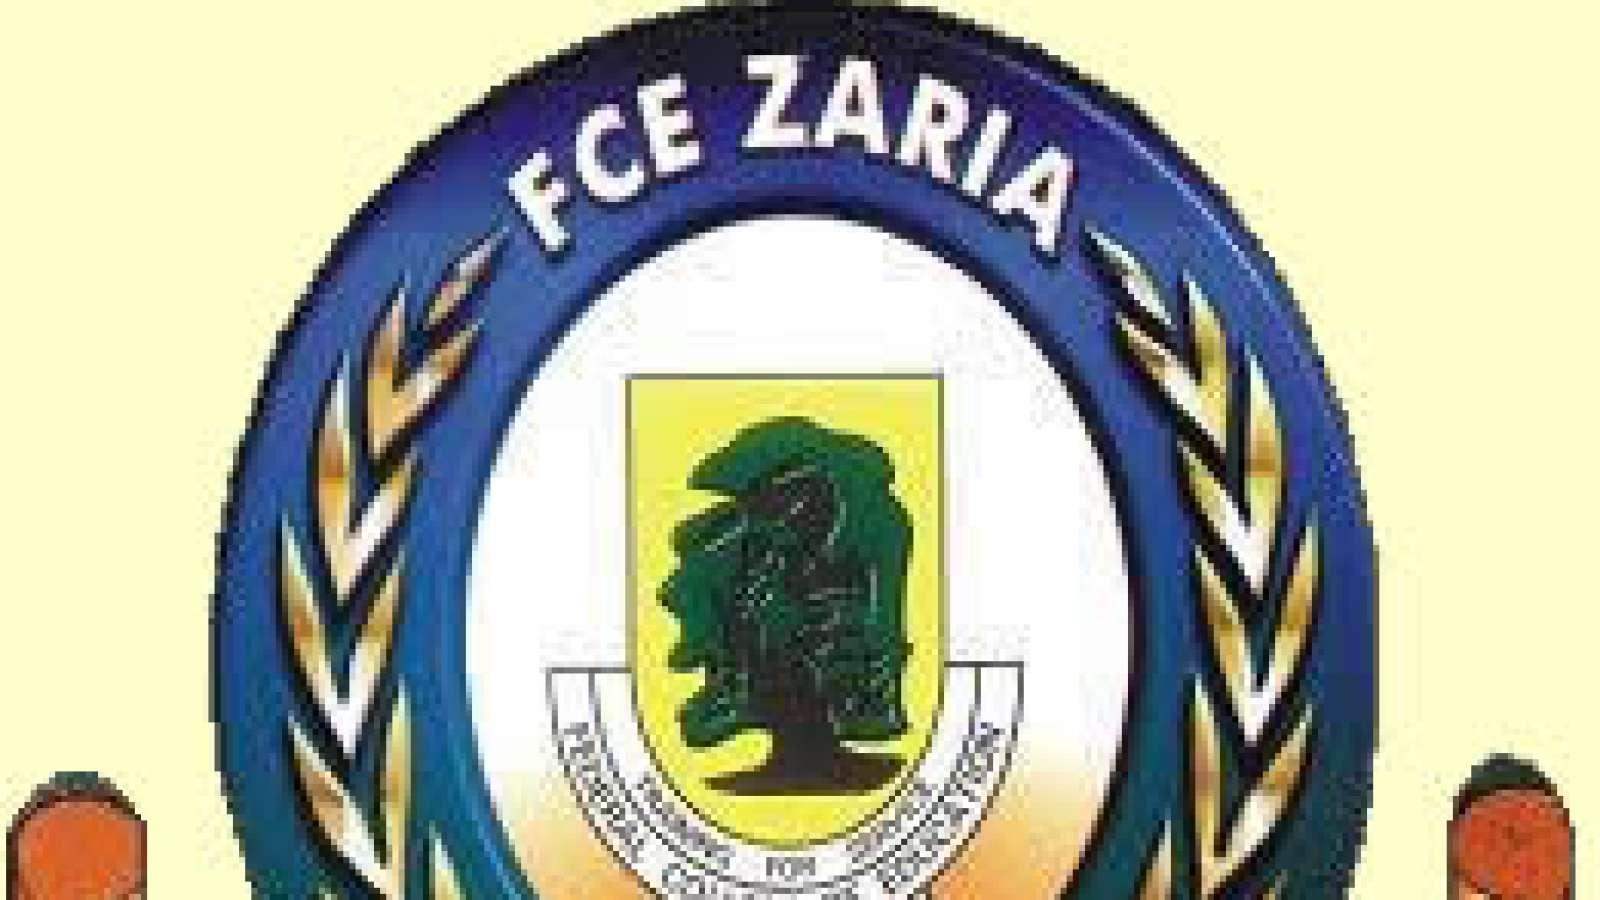 Federal College of Education Zaria - FCE Zaria 2017/2018 Post-UTME Screening (NCE Regular) Announced